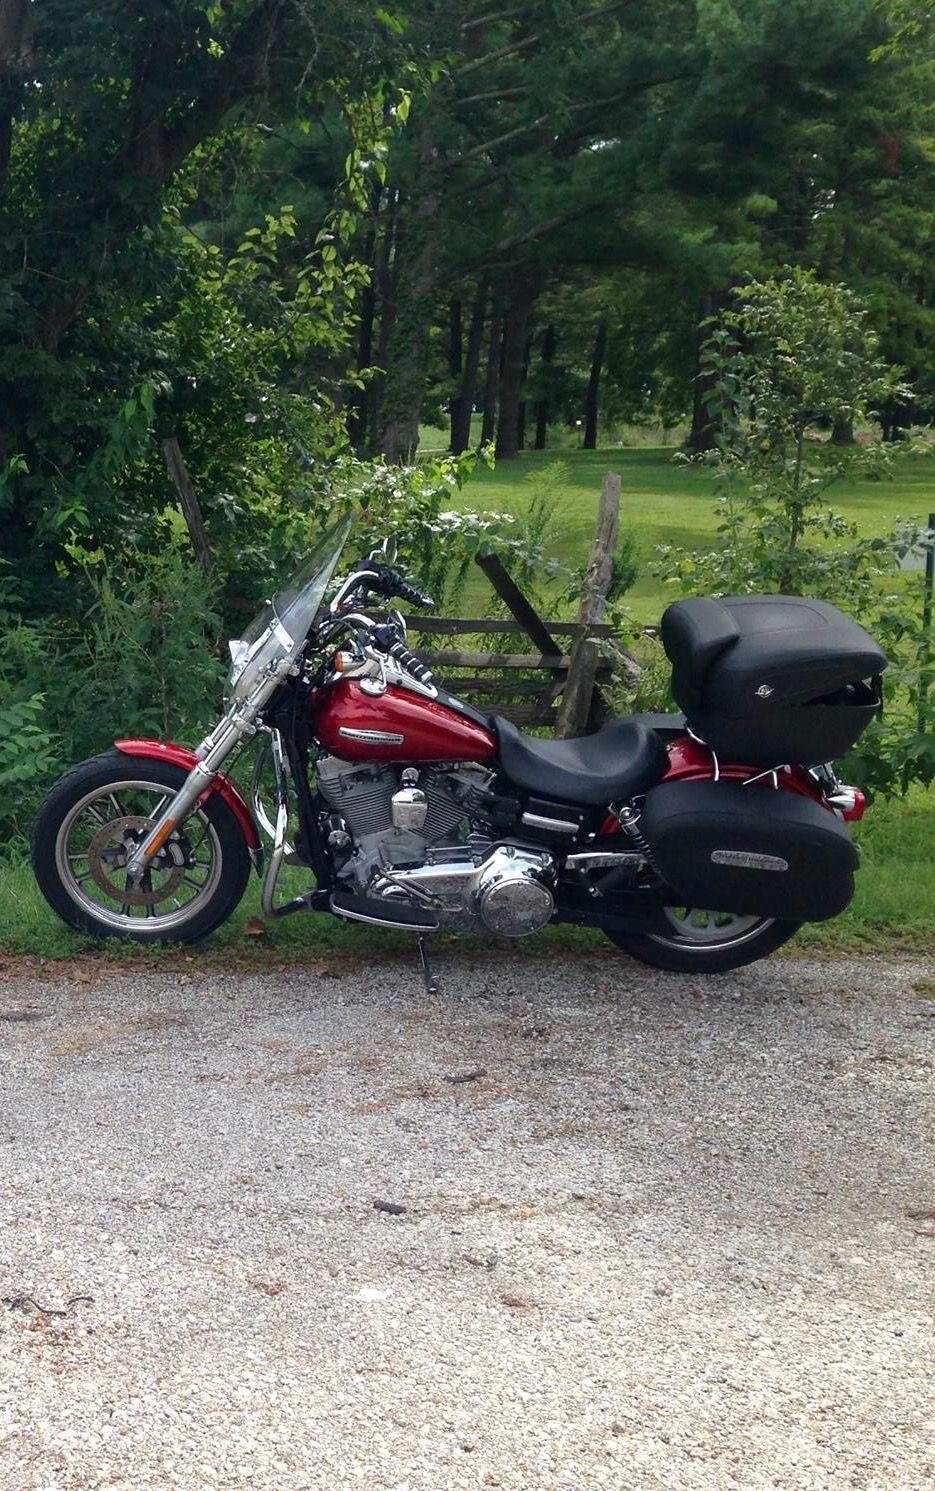 Harley Davidson Saddlebags: Looking For Saddlebags For Dyna Fat Bob